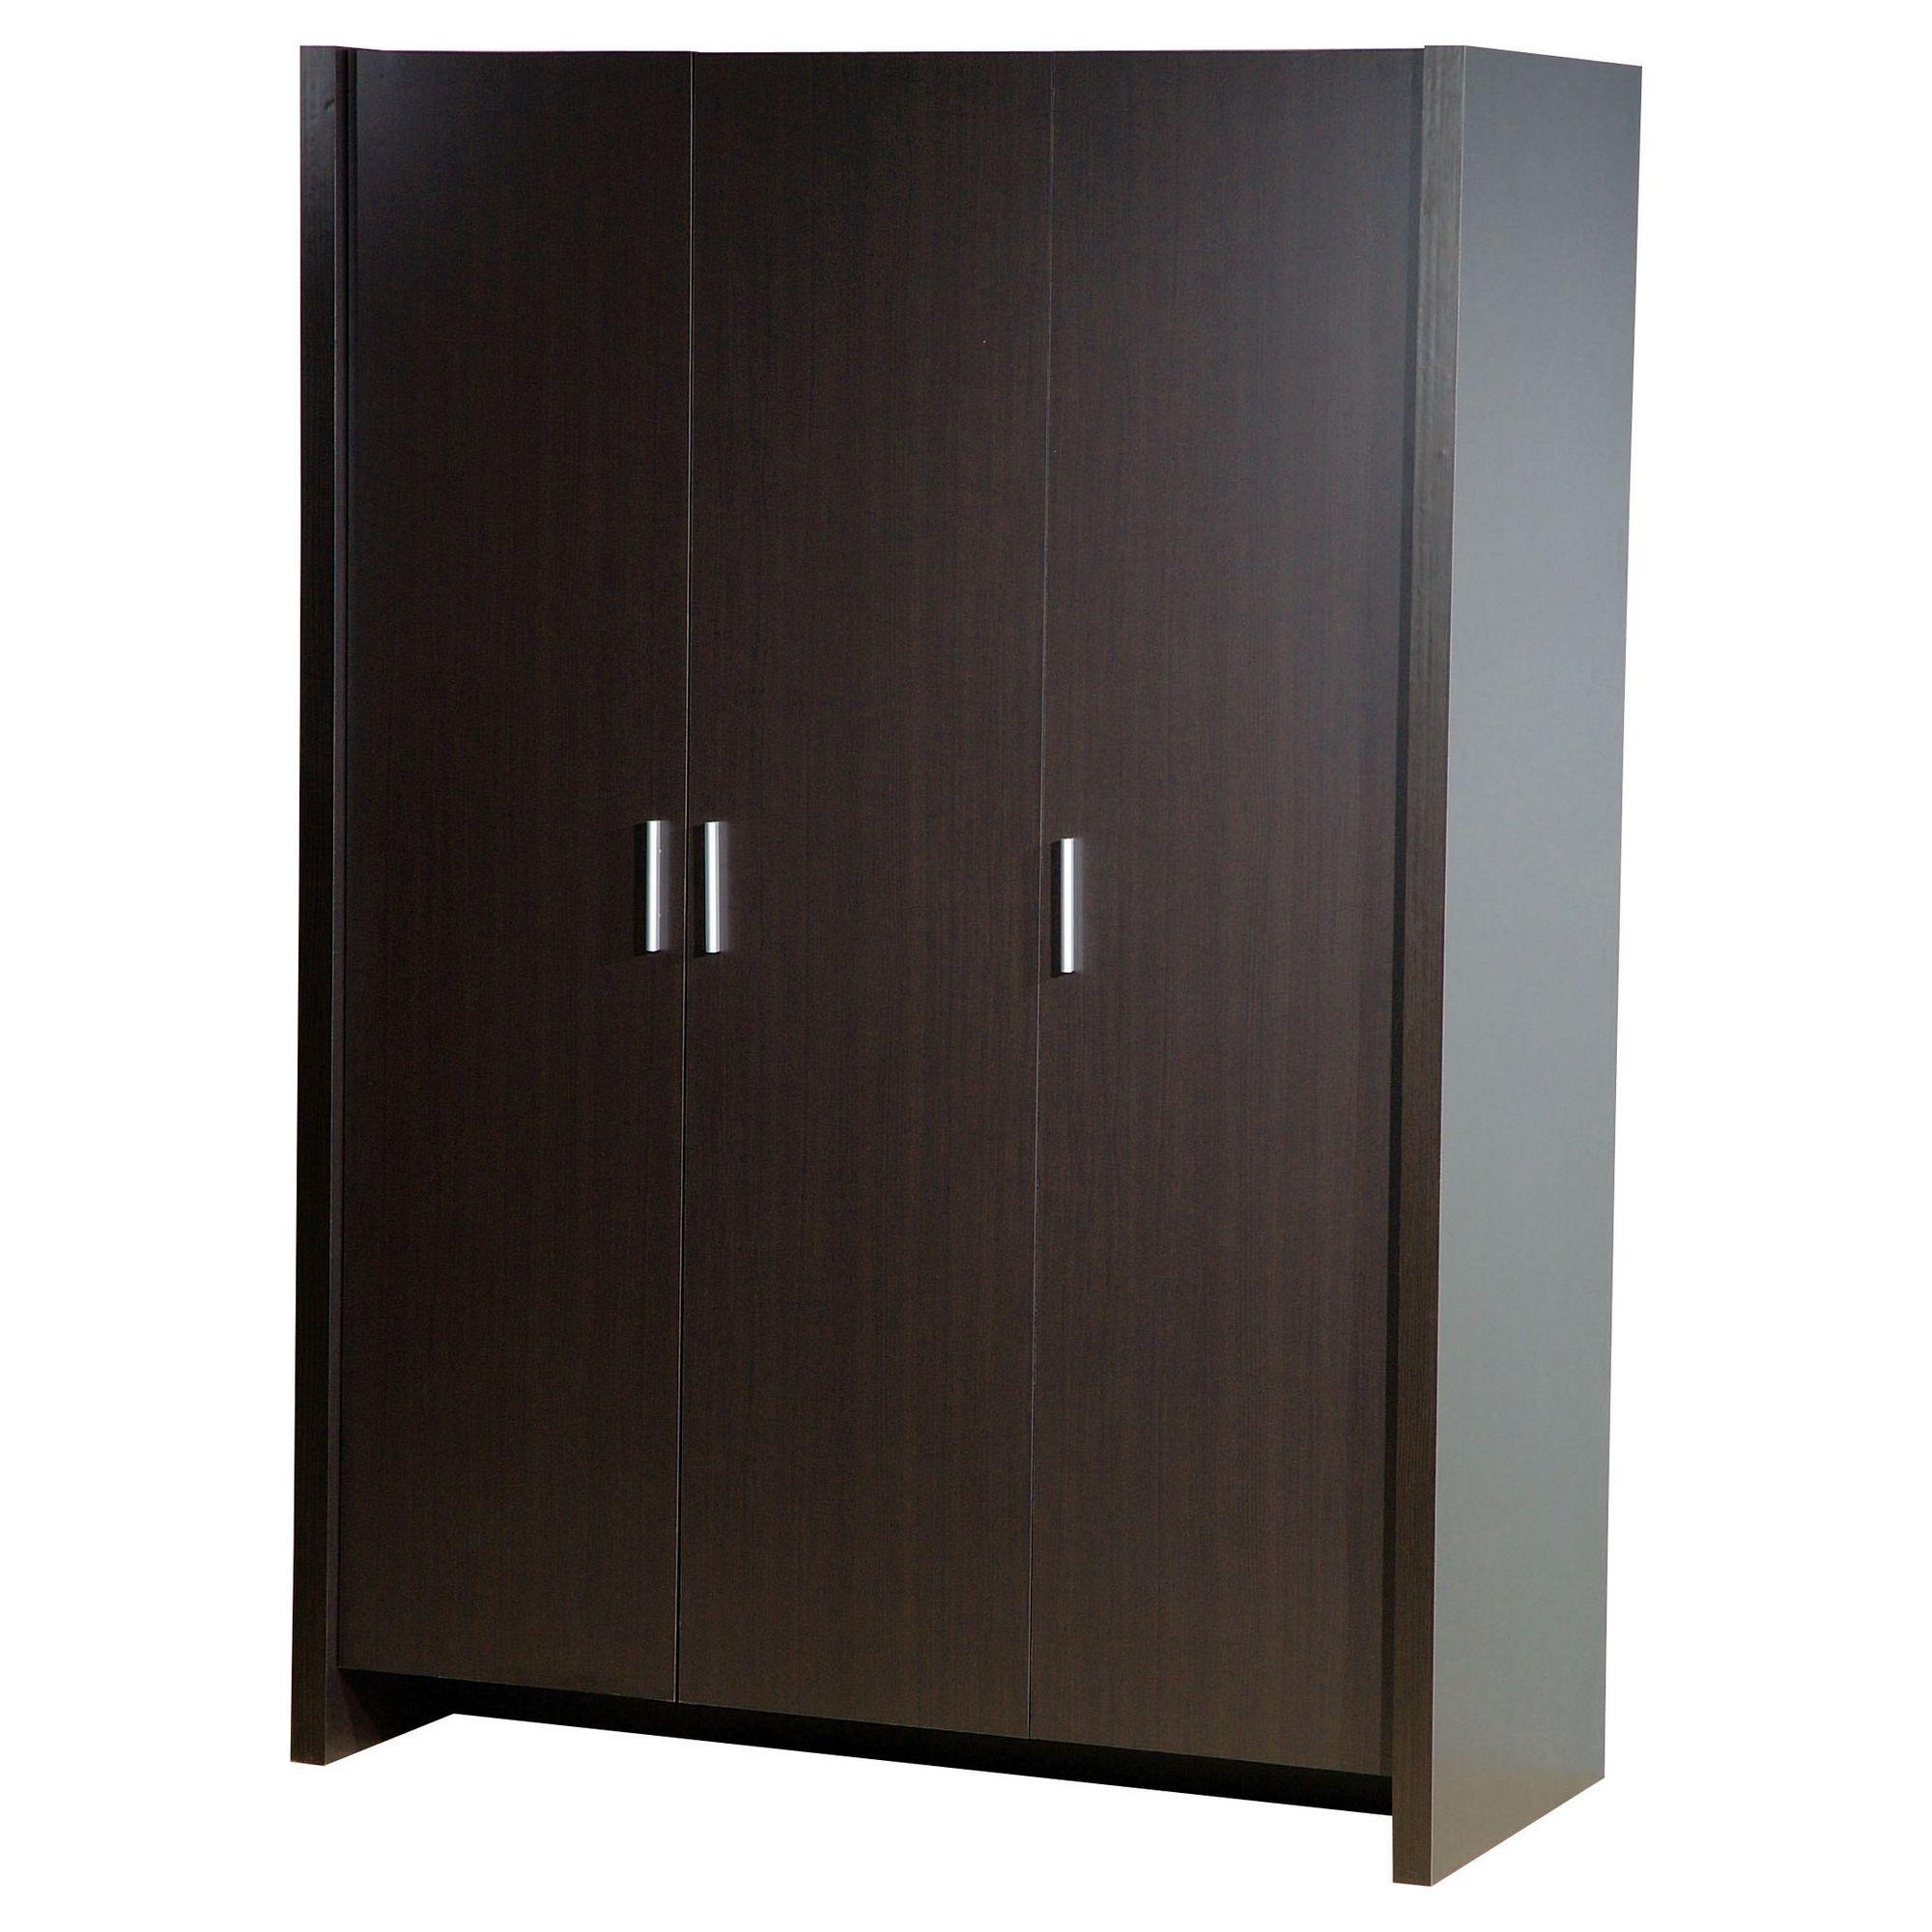 Home Essence Braemar Three Door Wardrobe in Espresso Brown at Tescos Direct